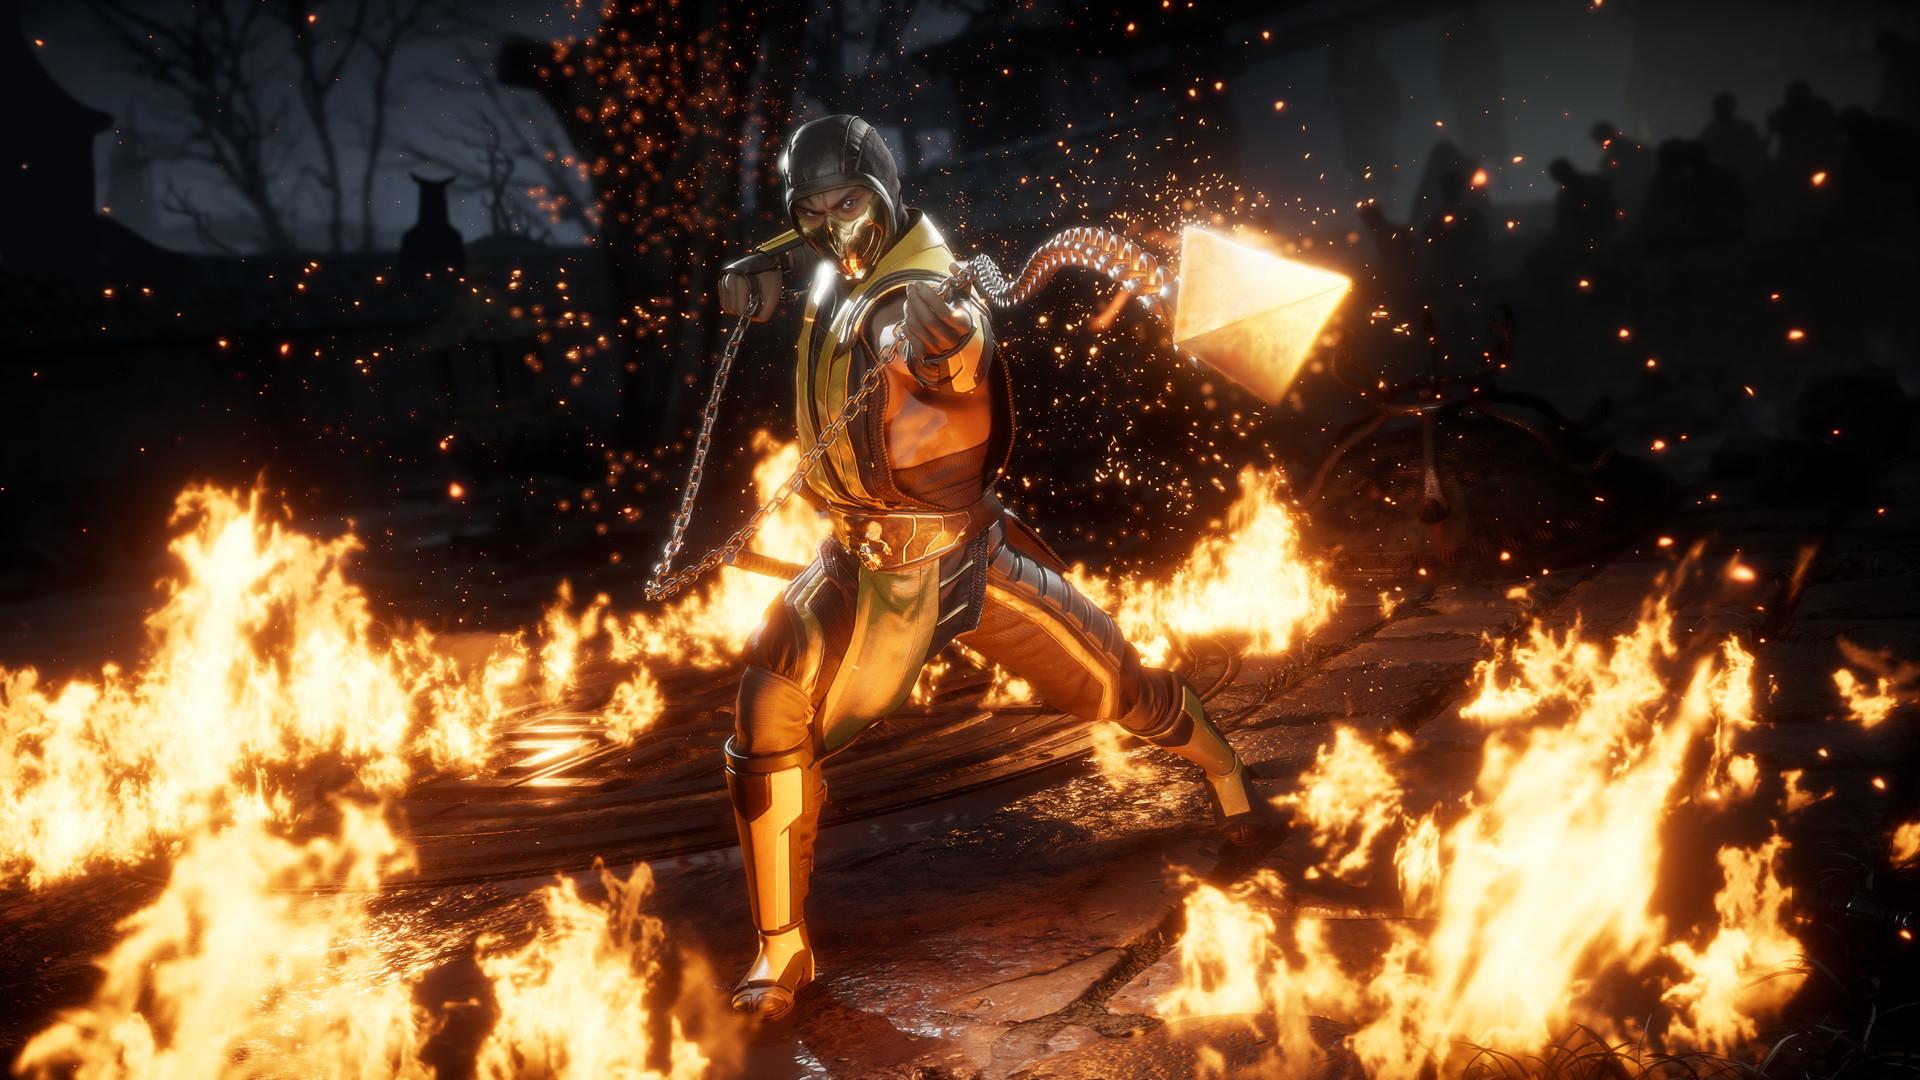 Mortal Kombat ศึกเกมต่อสู้สุดระห่ำ (2)